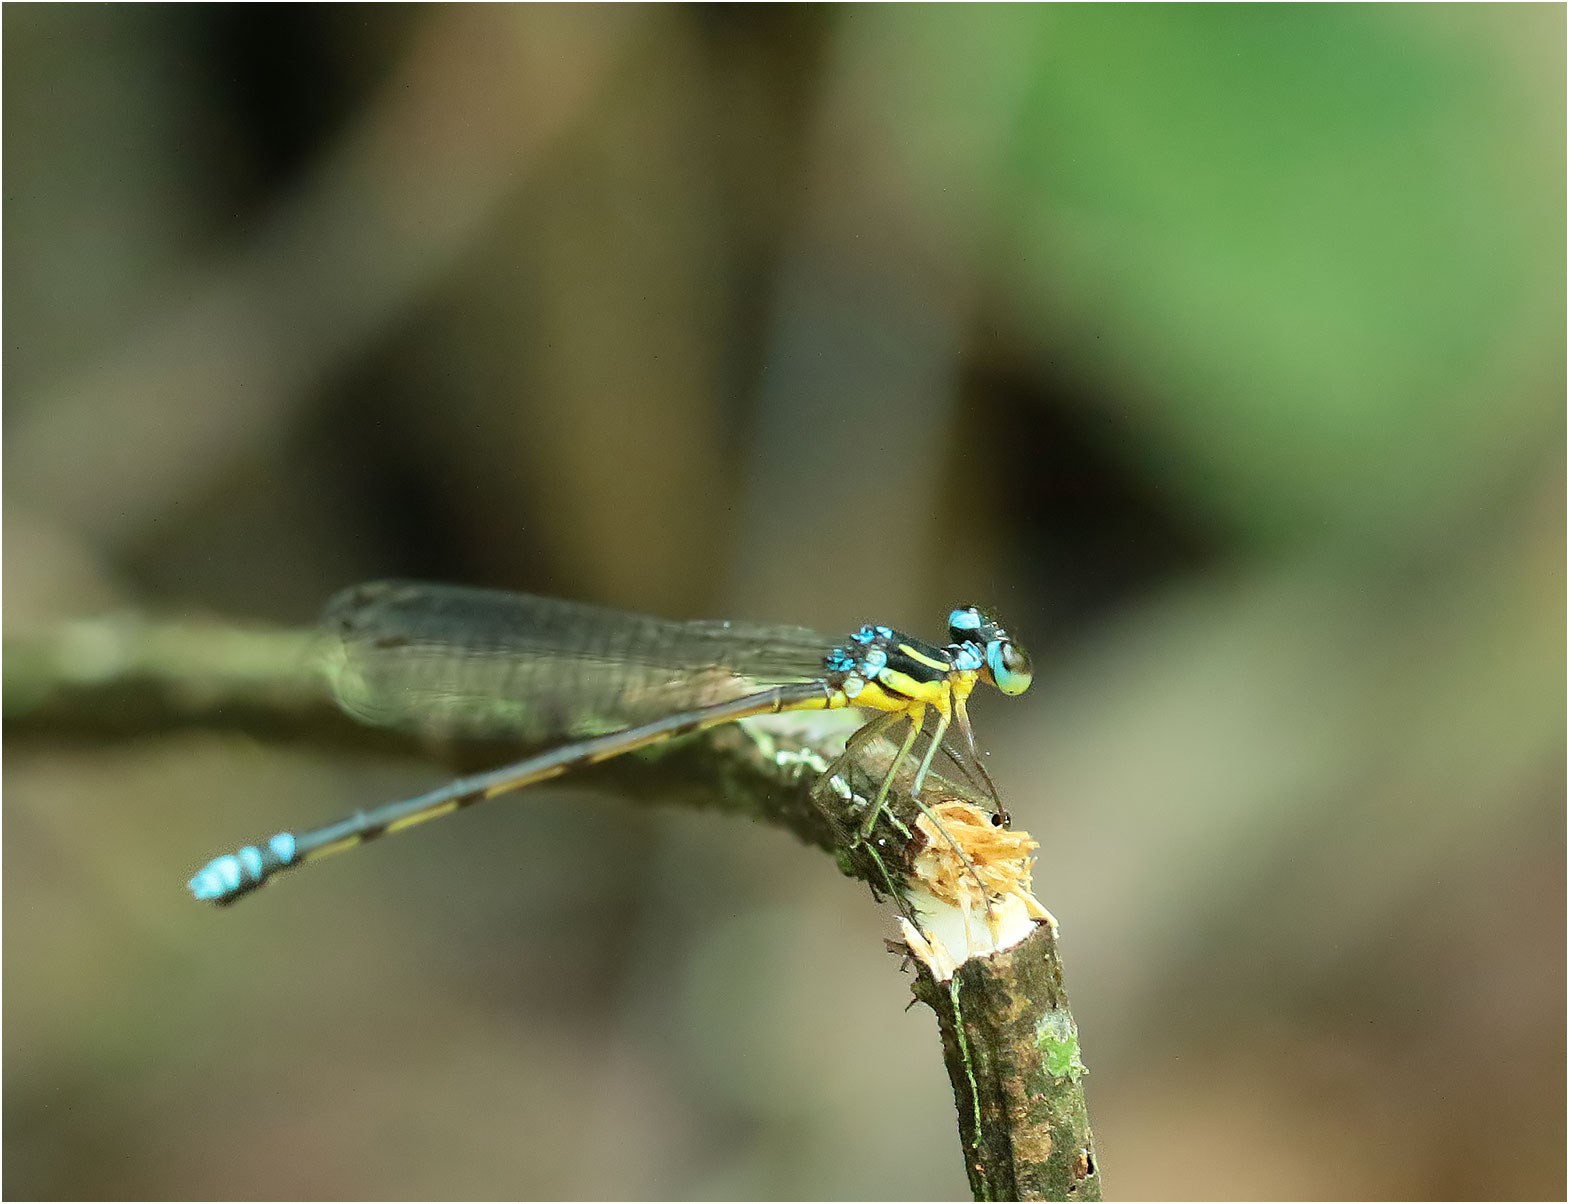 Sinosticta debra femelle, Vietnam, Xuan Son, 08/06/2018